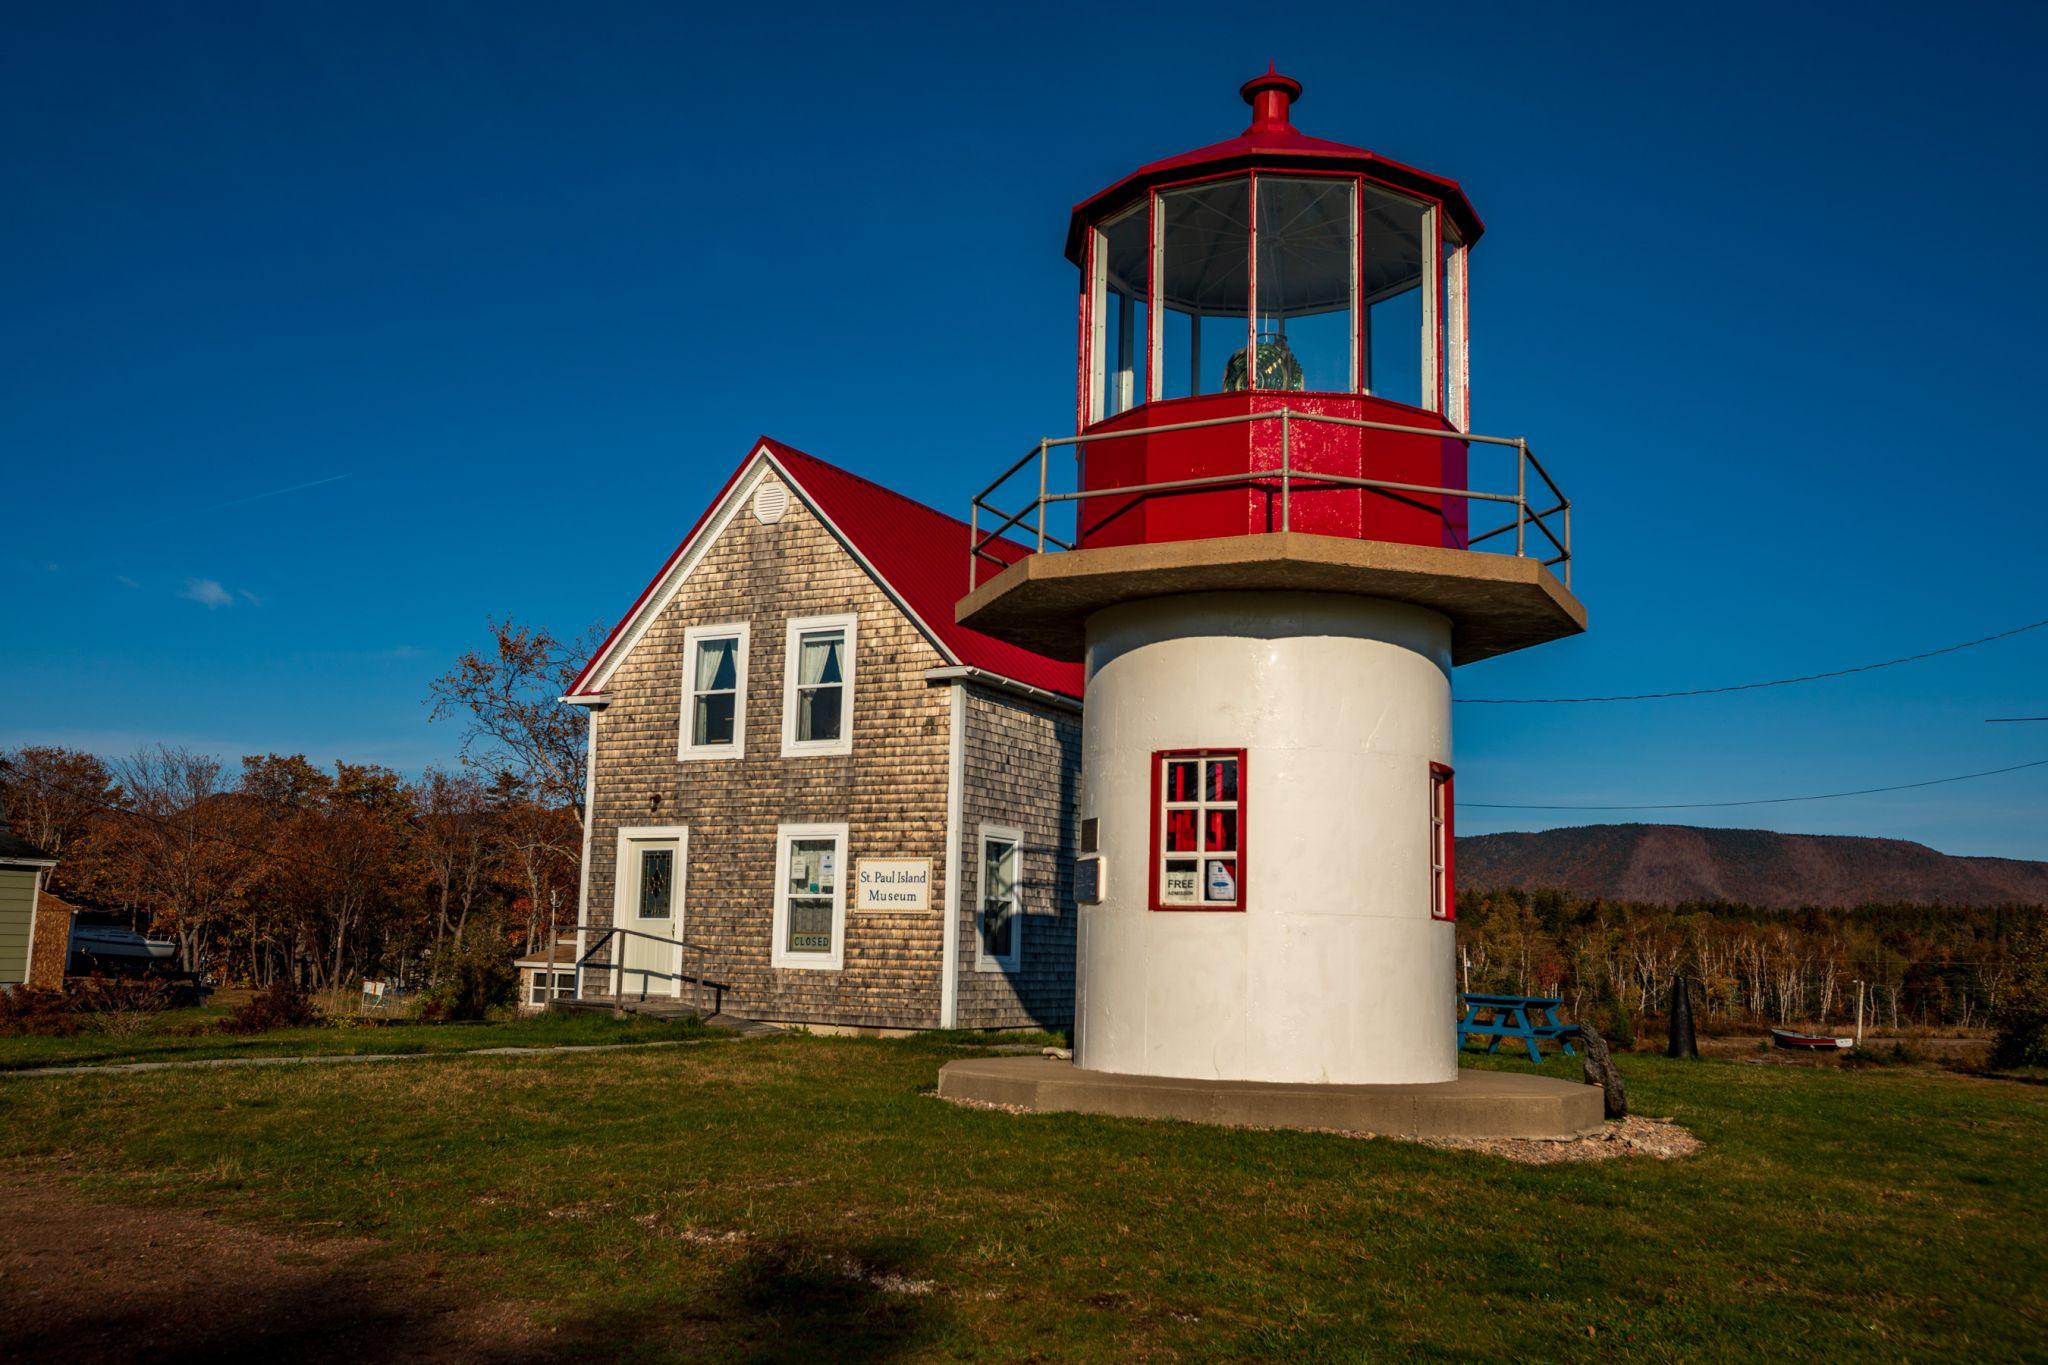 St. Paul Lighthouse, Dingwall, Cape Breton Nova Scotia, Canada